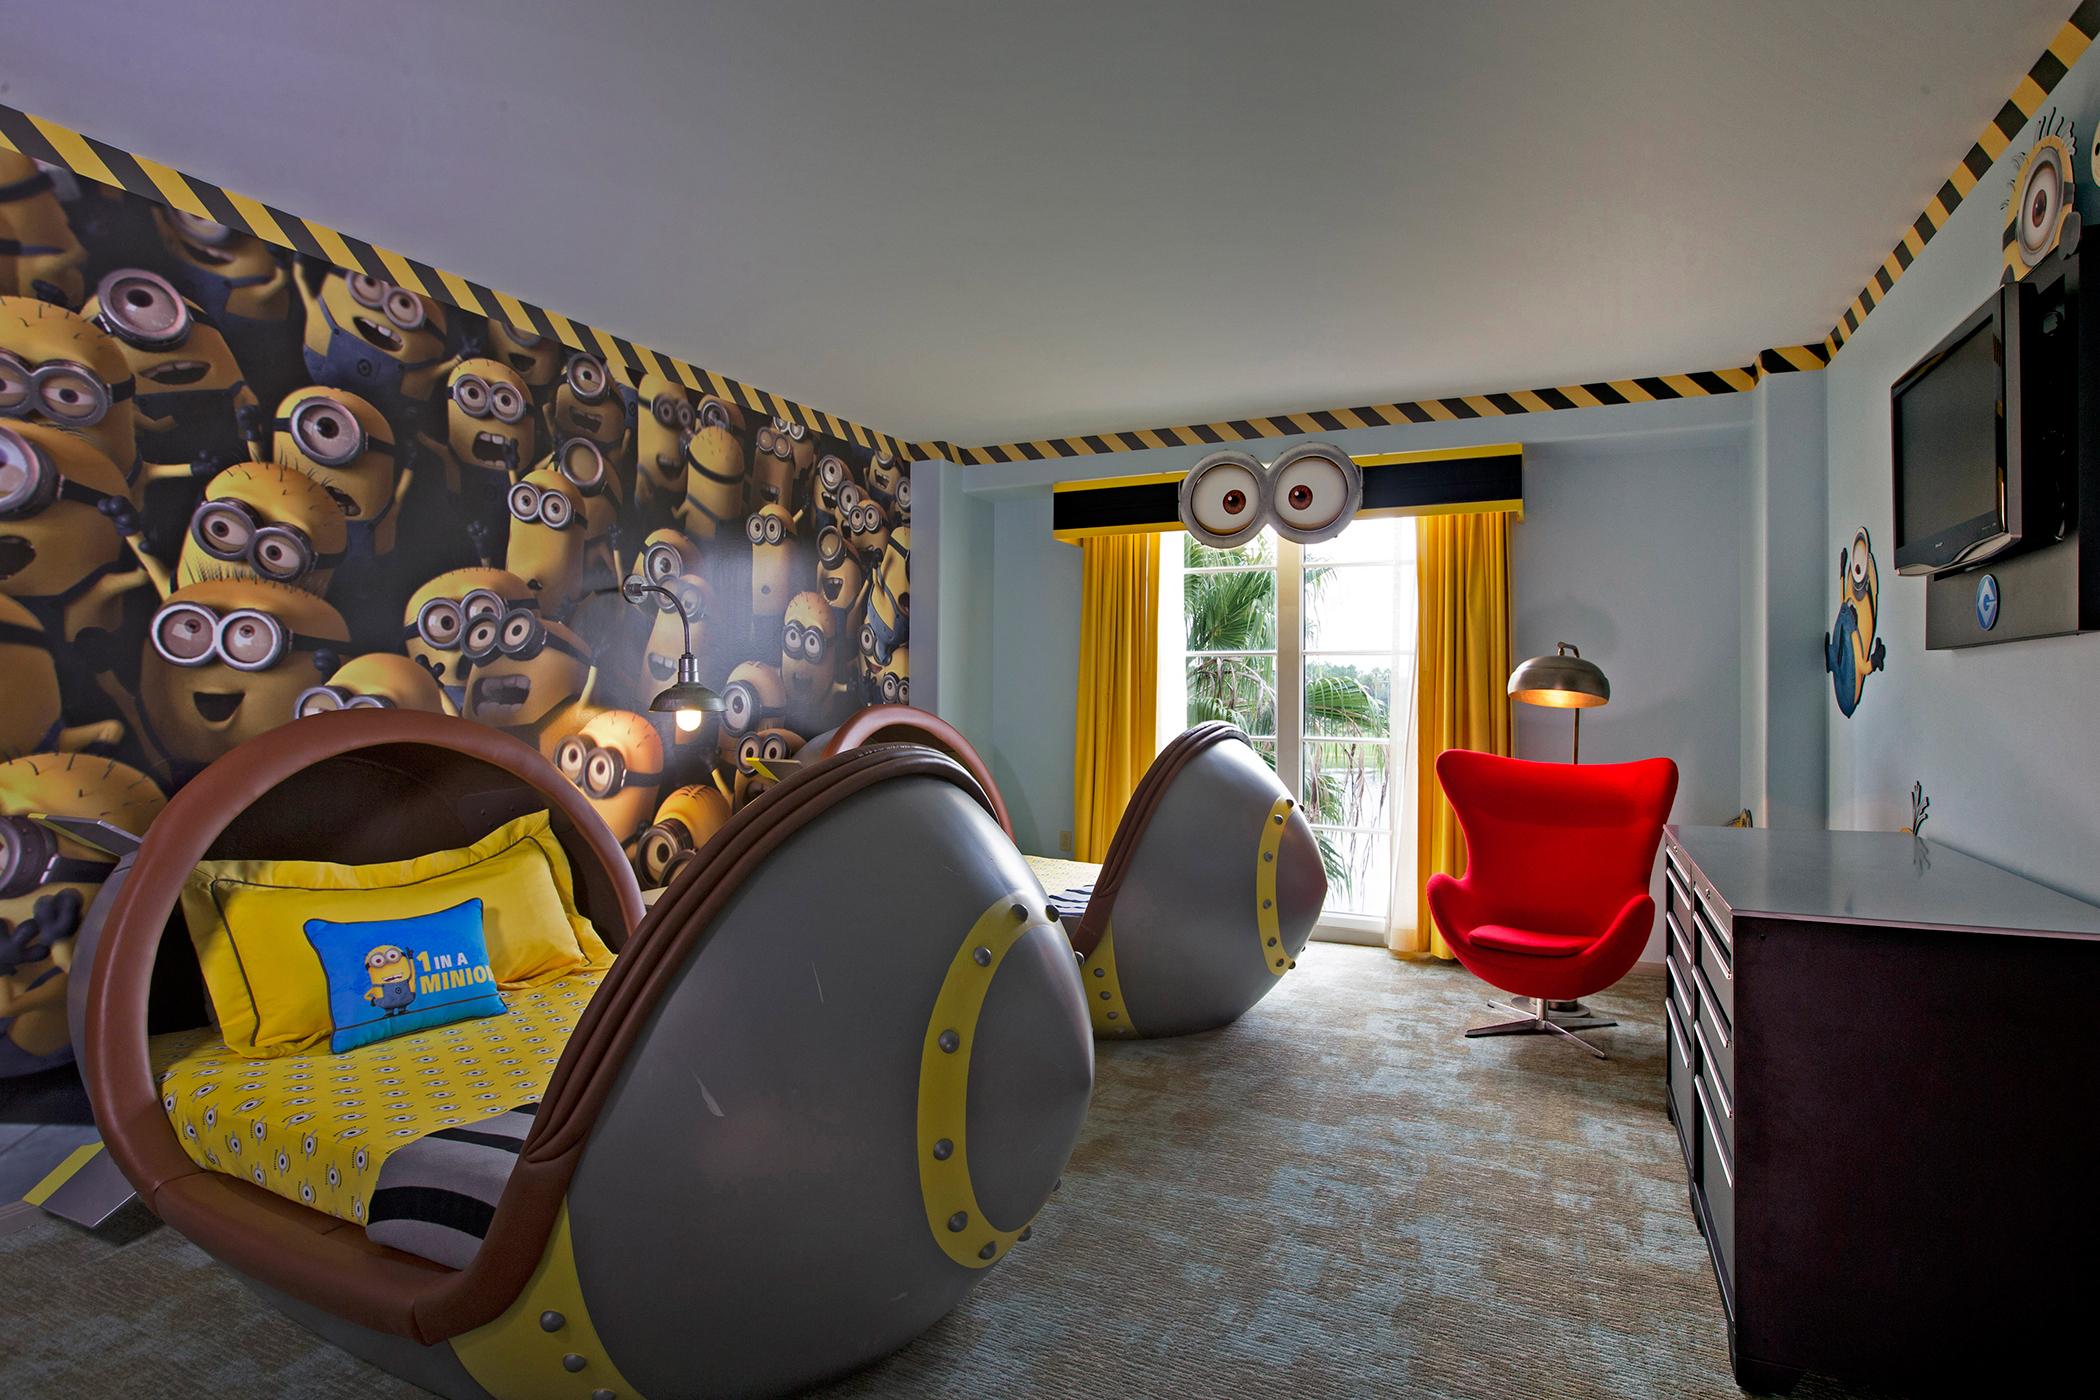 170518-universal-studios-cost-loews-portofino-bay-hotel-despicable-me-suite